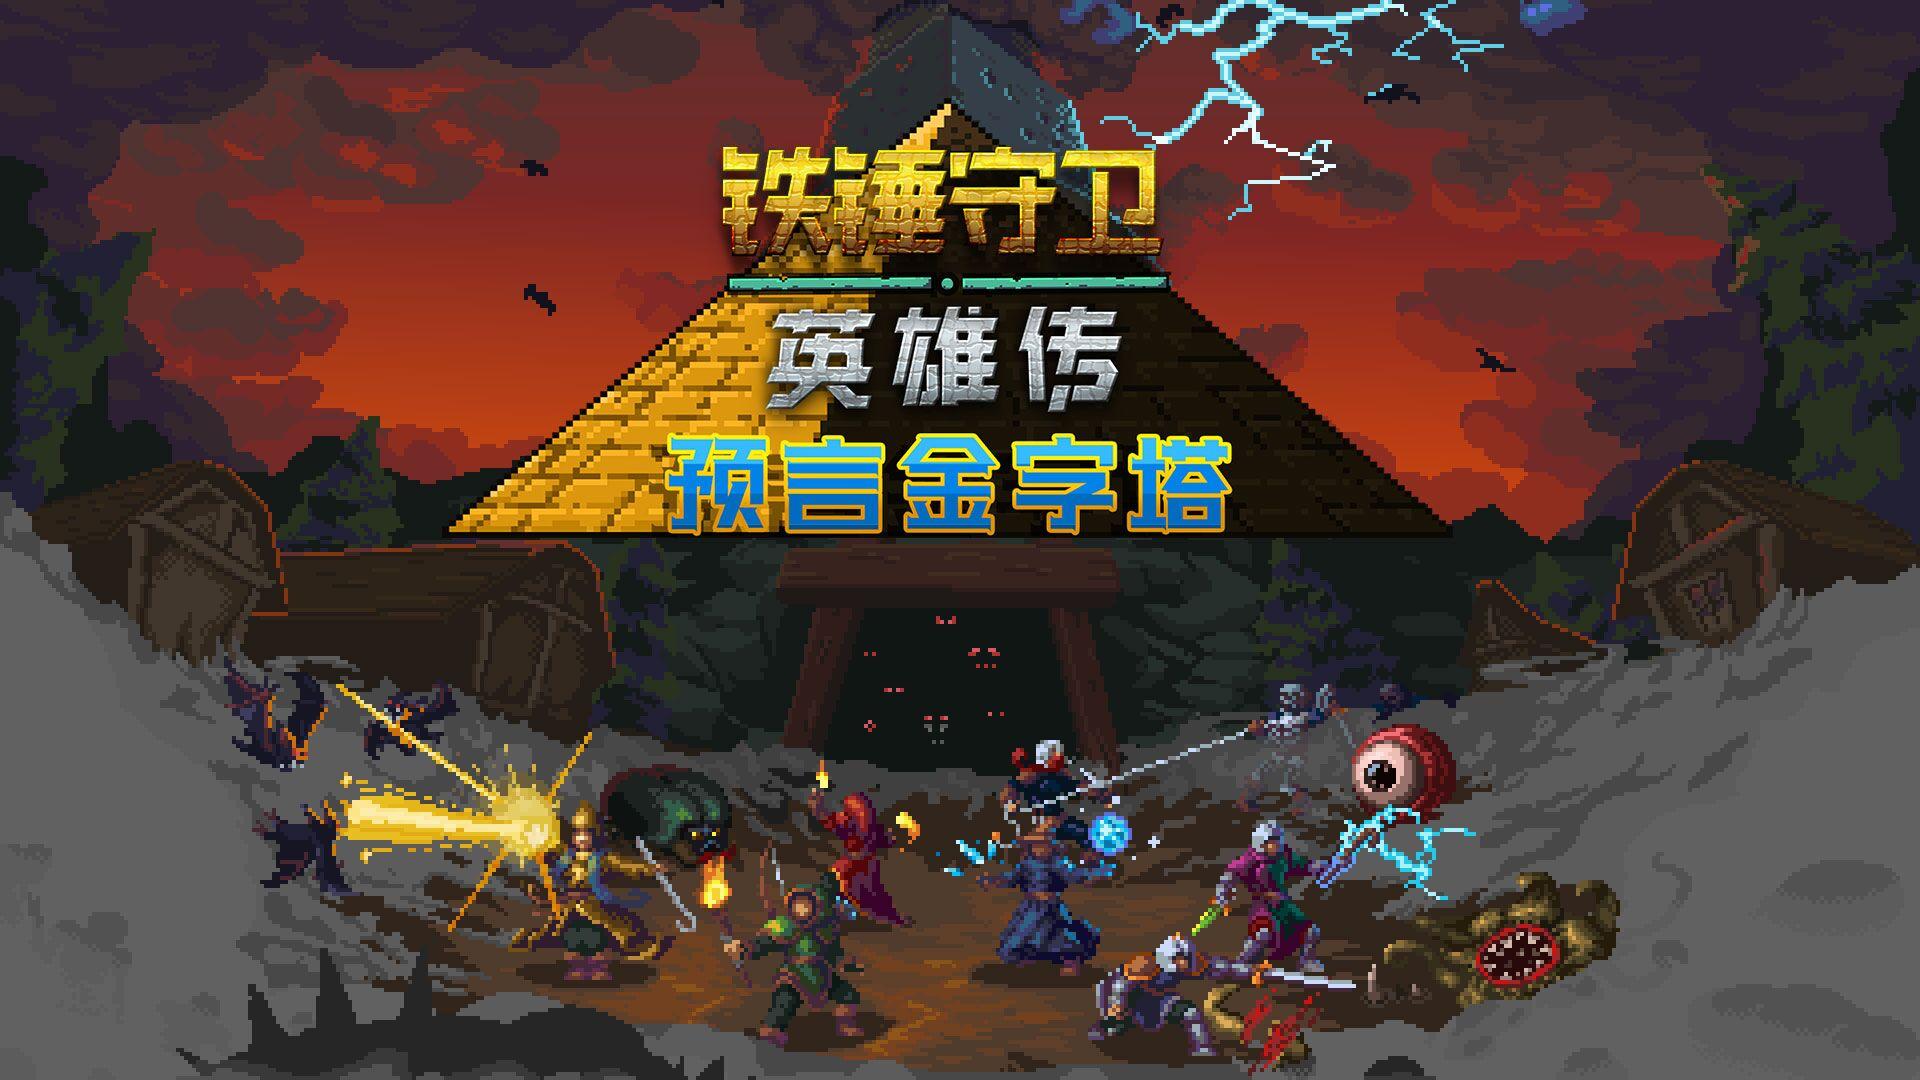 "<b>《铁锤守卫:英雄传》大型DLC""预言金字塔""全新预告片</b>"